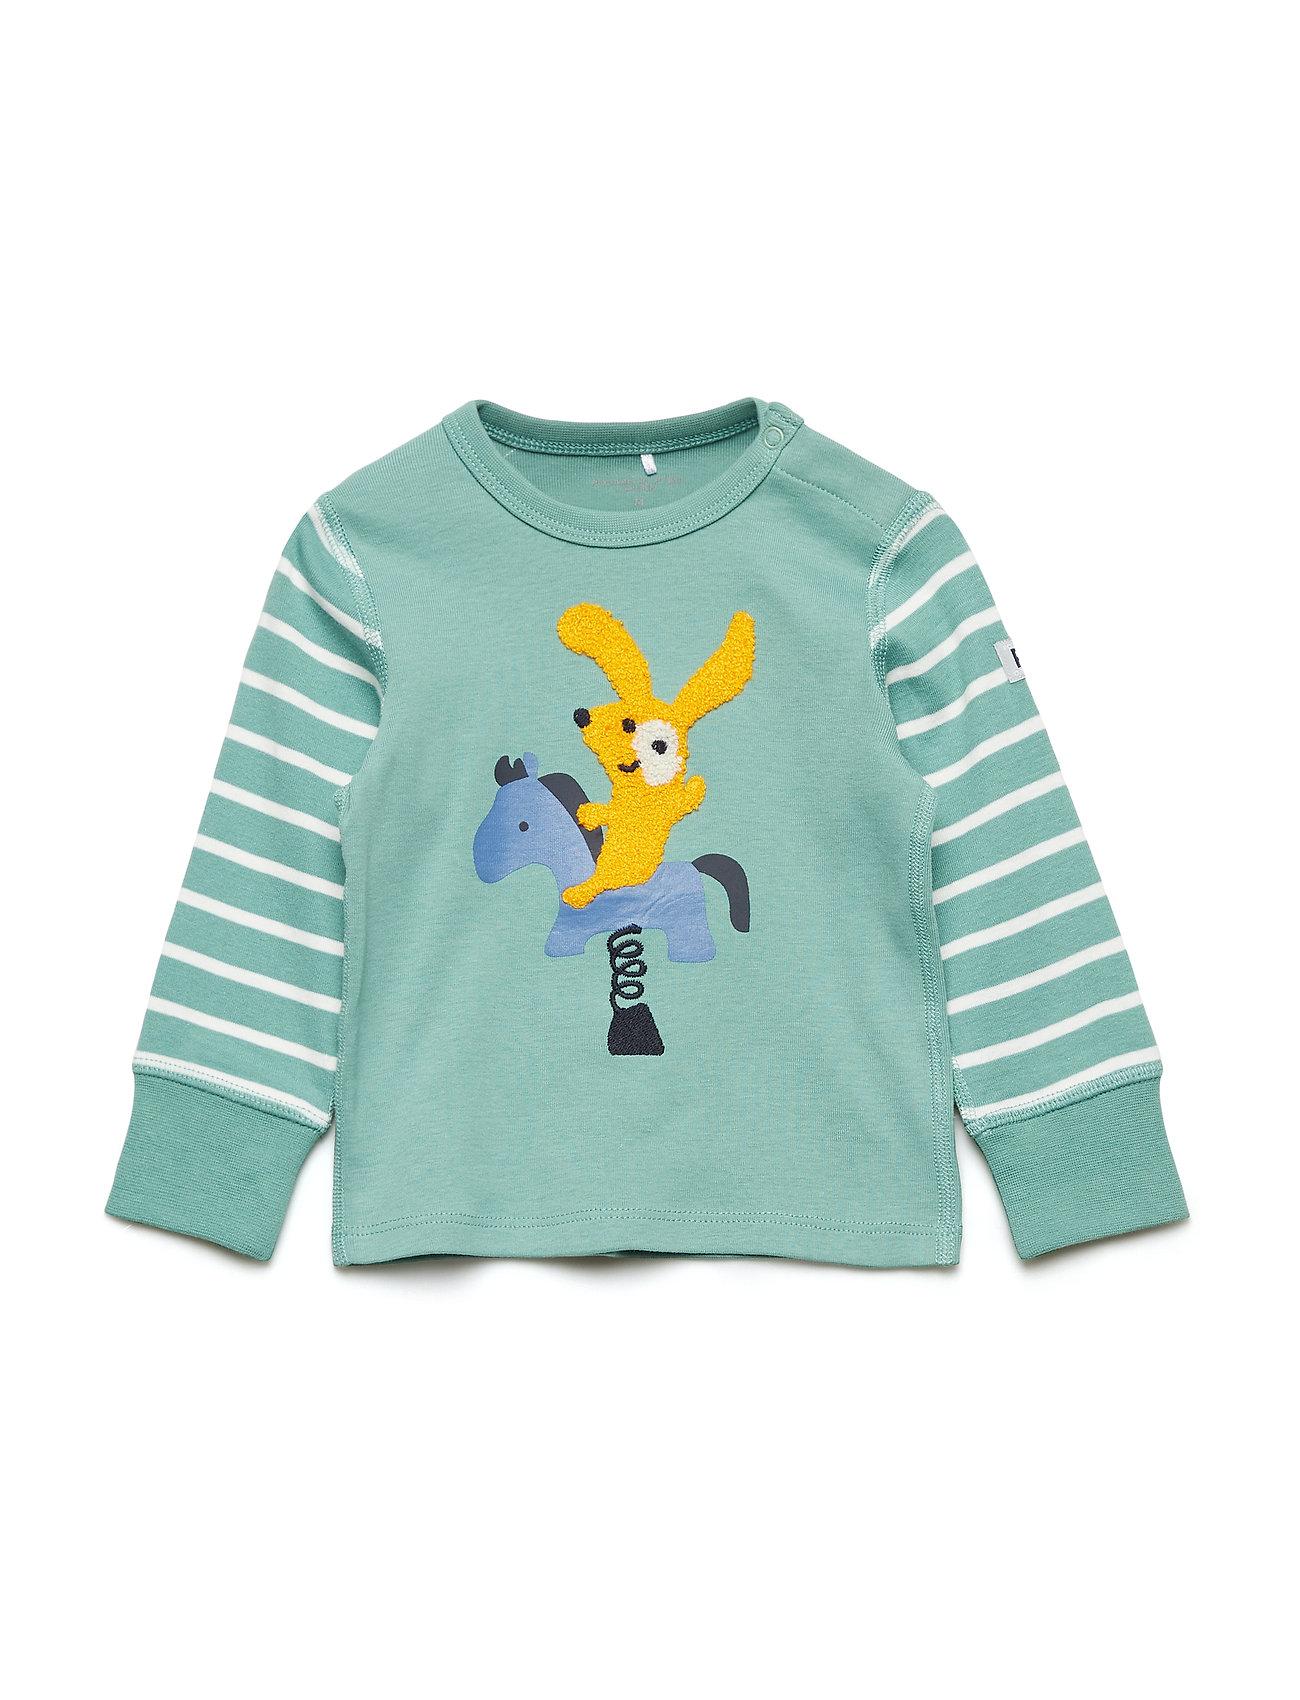 Polarn O. Pyret T-shirt Long Sleeve PO.P Stripe Baby - MALACHITE GREEN